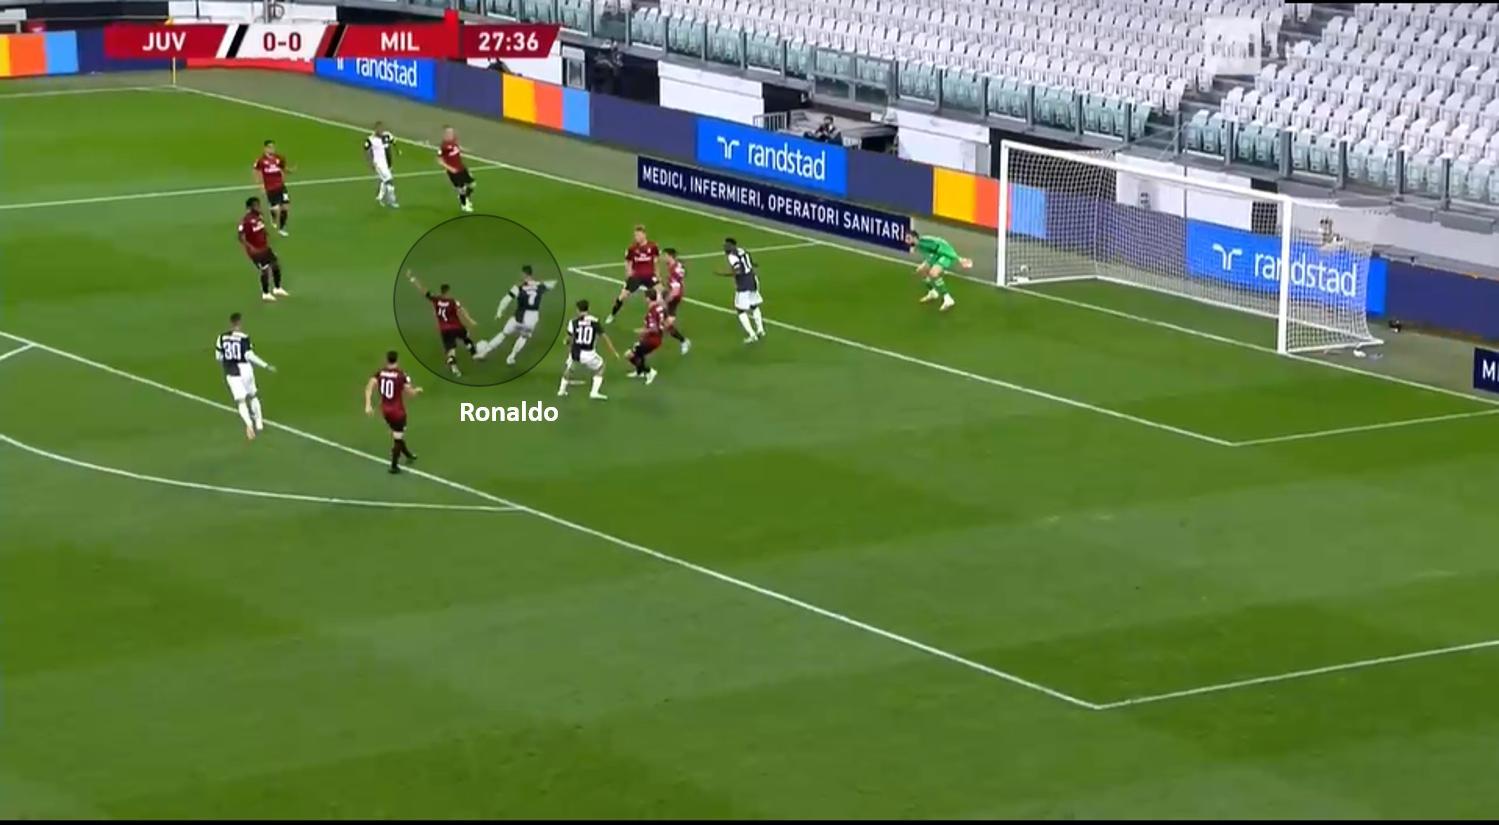 Coppa Italia 2019/20: Juventus vs Milan – tactical analysis tactics